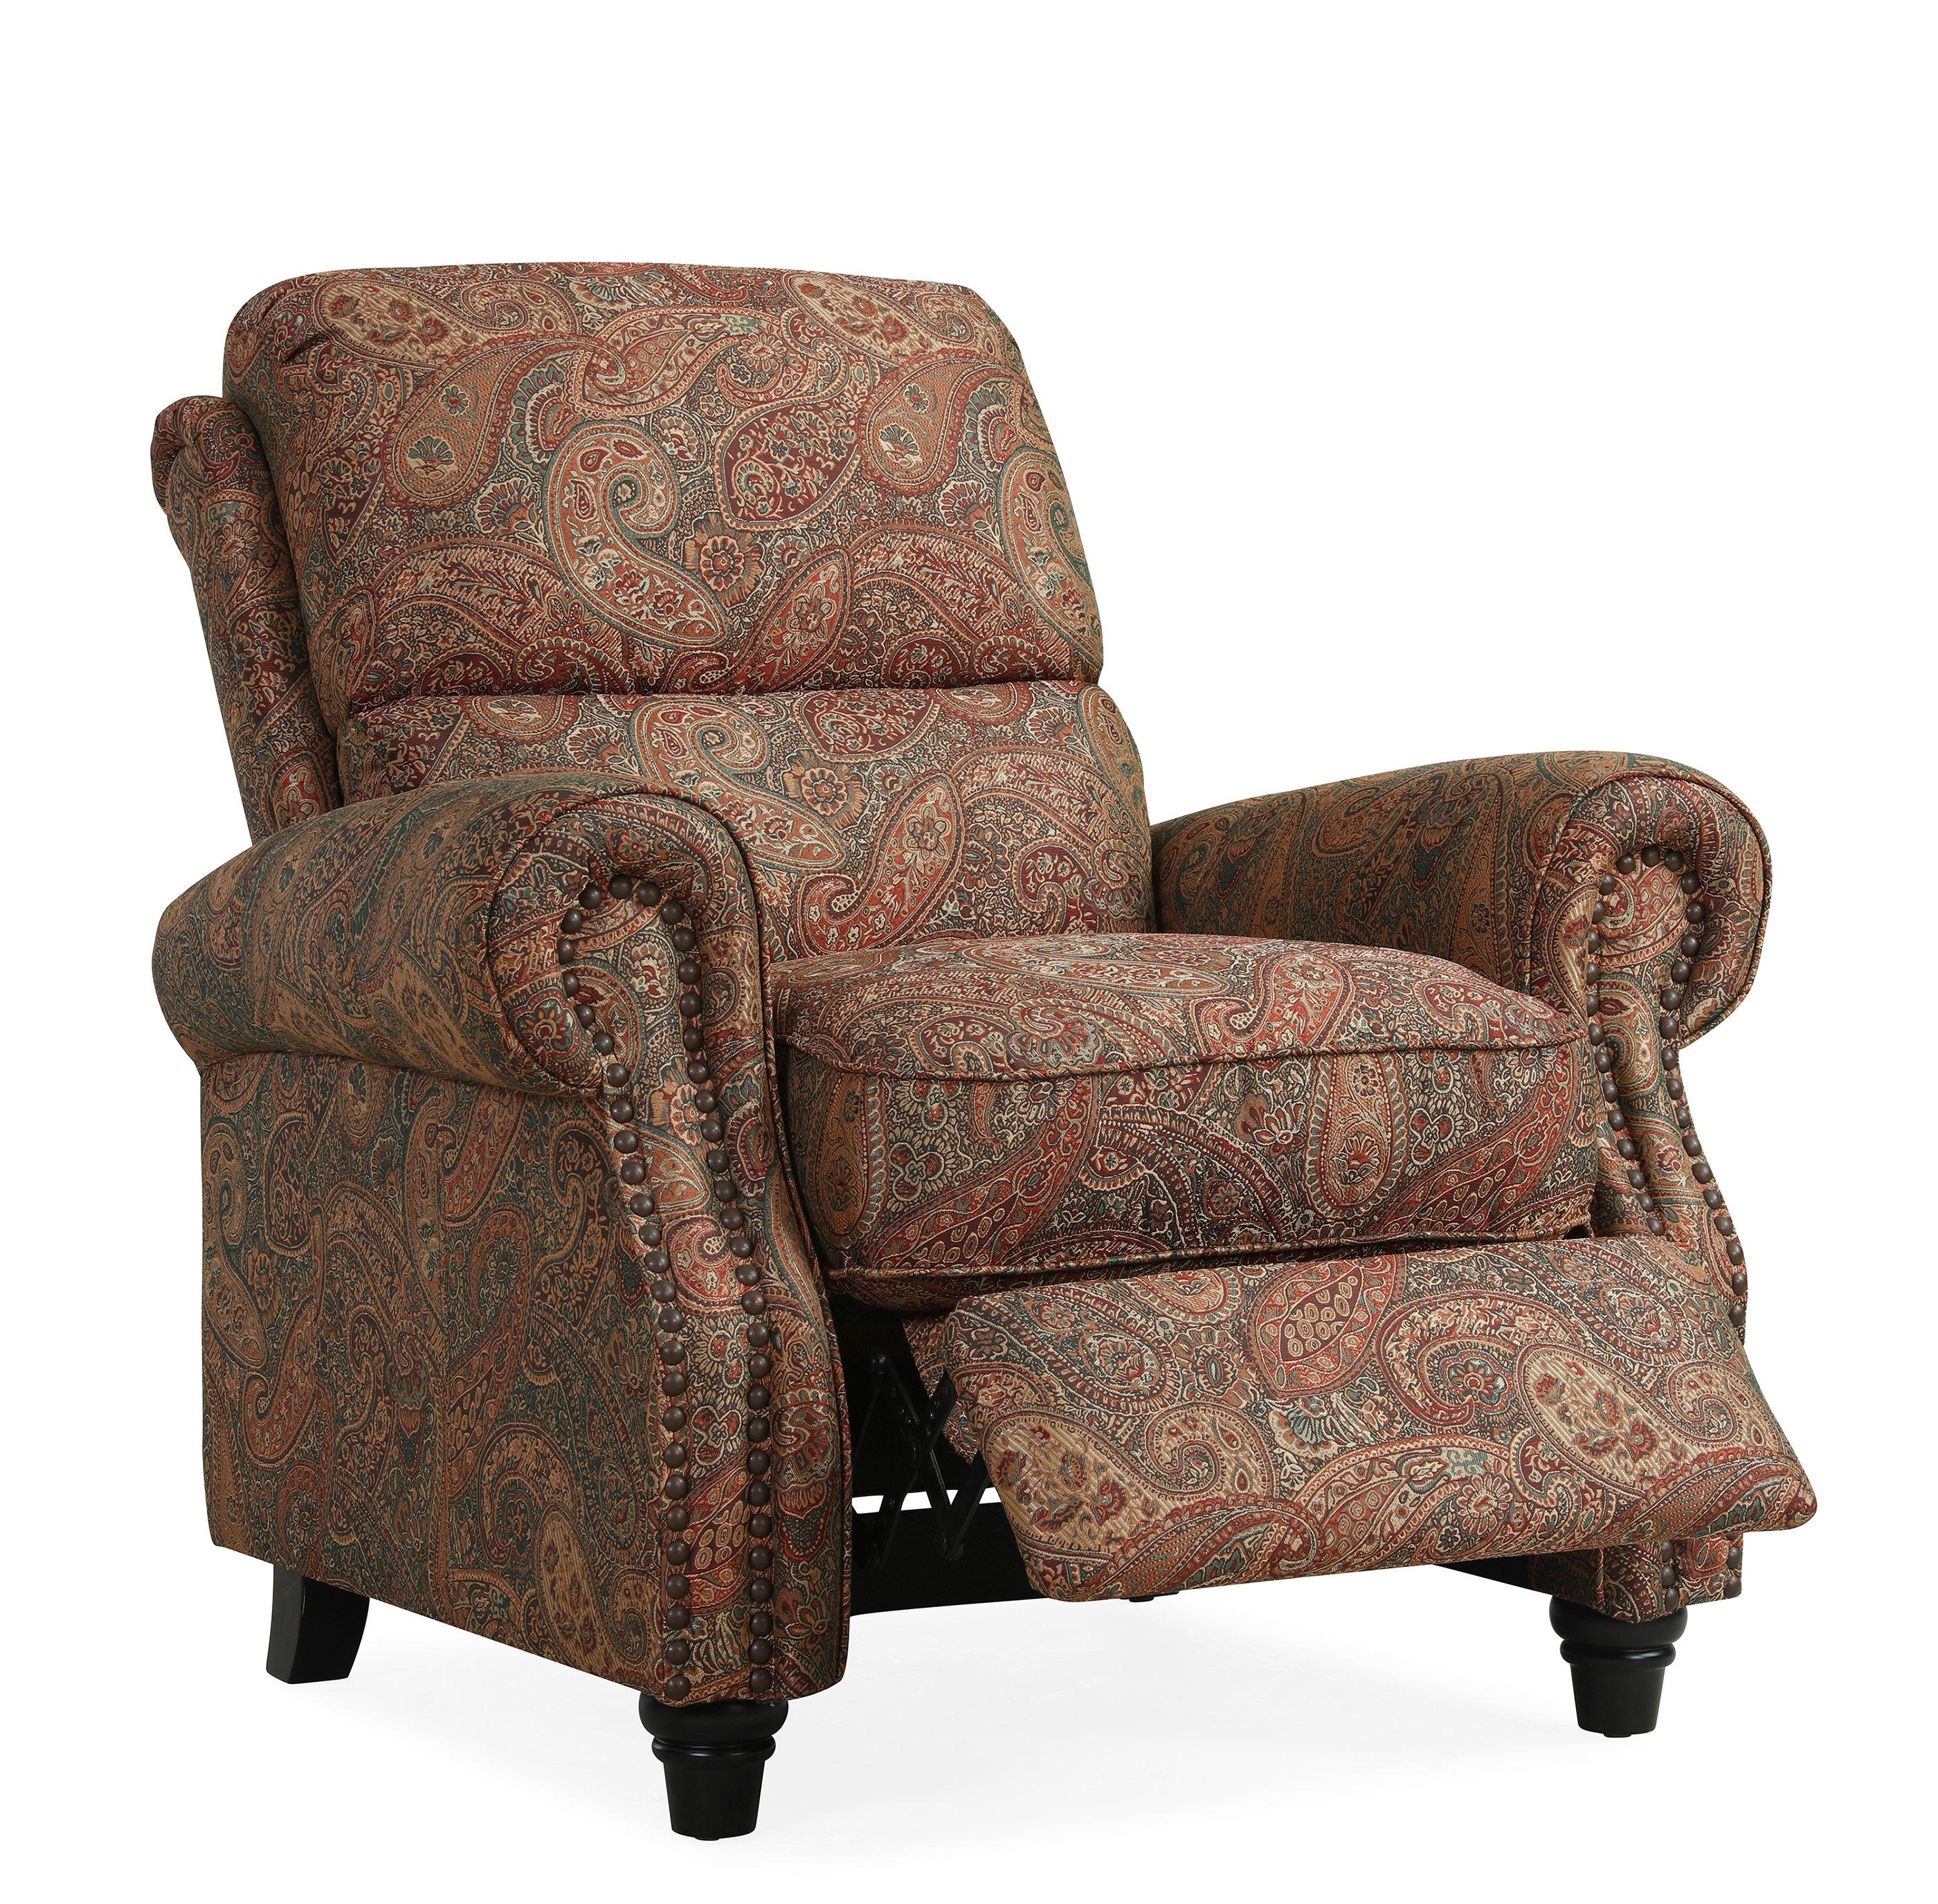 Home Recliner Chair Furniture Chair